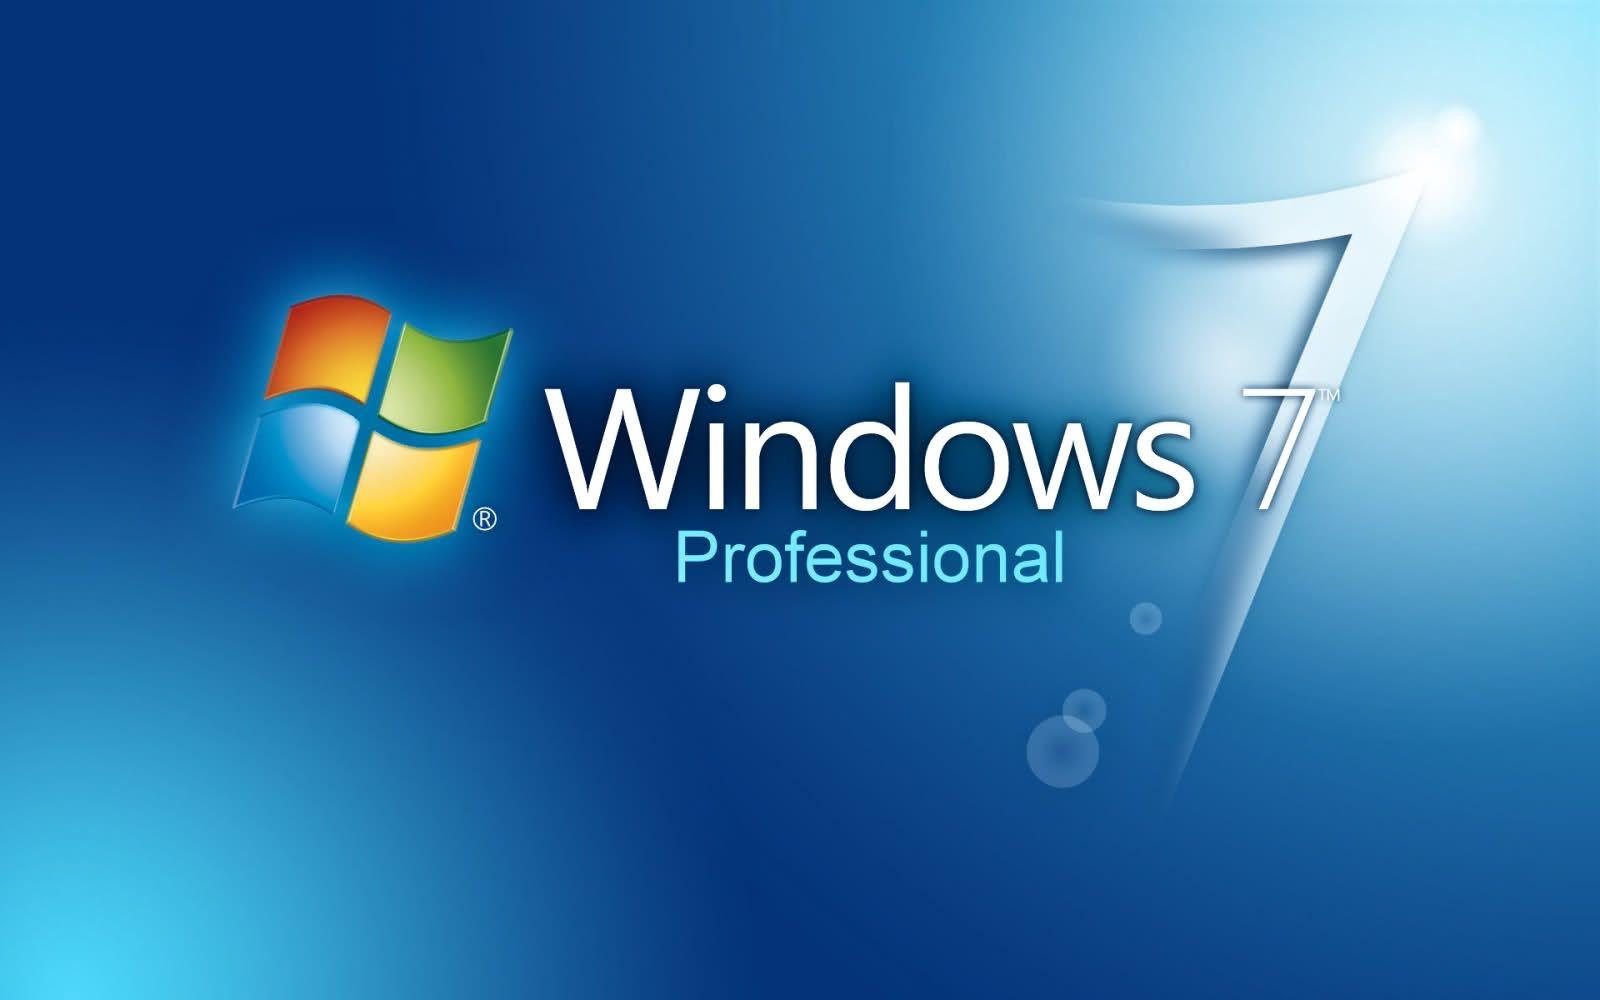 Windows Wallpaper Hd 1600 1000 Windows 7 Professional Wallpapers Hd 46 Wallpapers Adorable Wallpapers Windows Seven Windows Microsoft Software